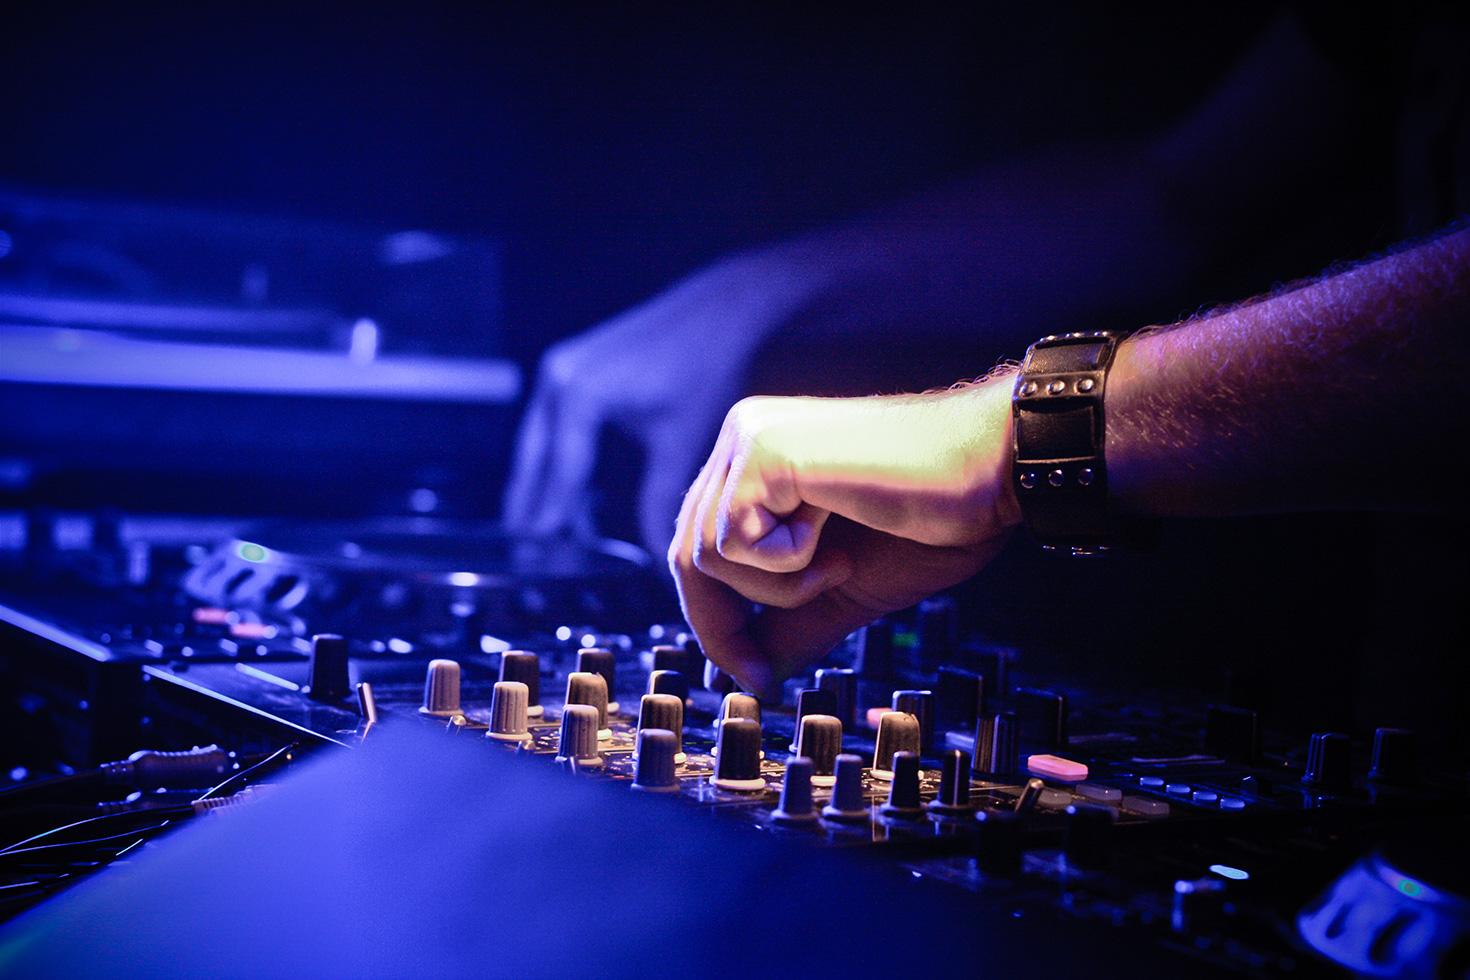 dj-in-the-mix-picjumbo-com